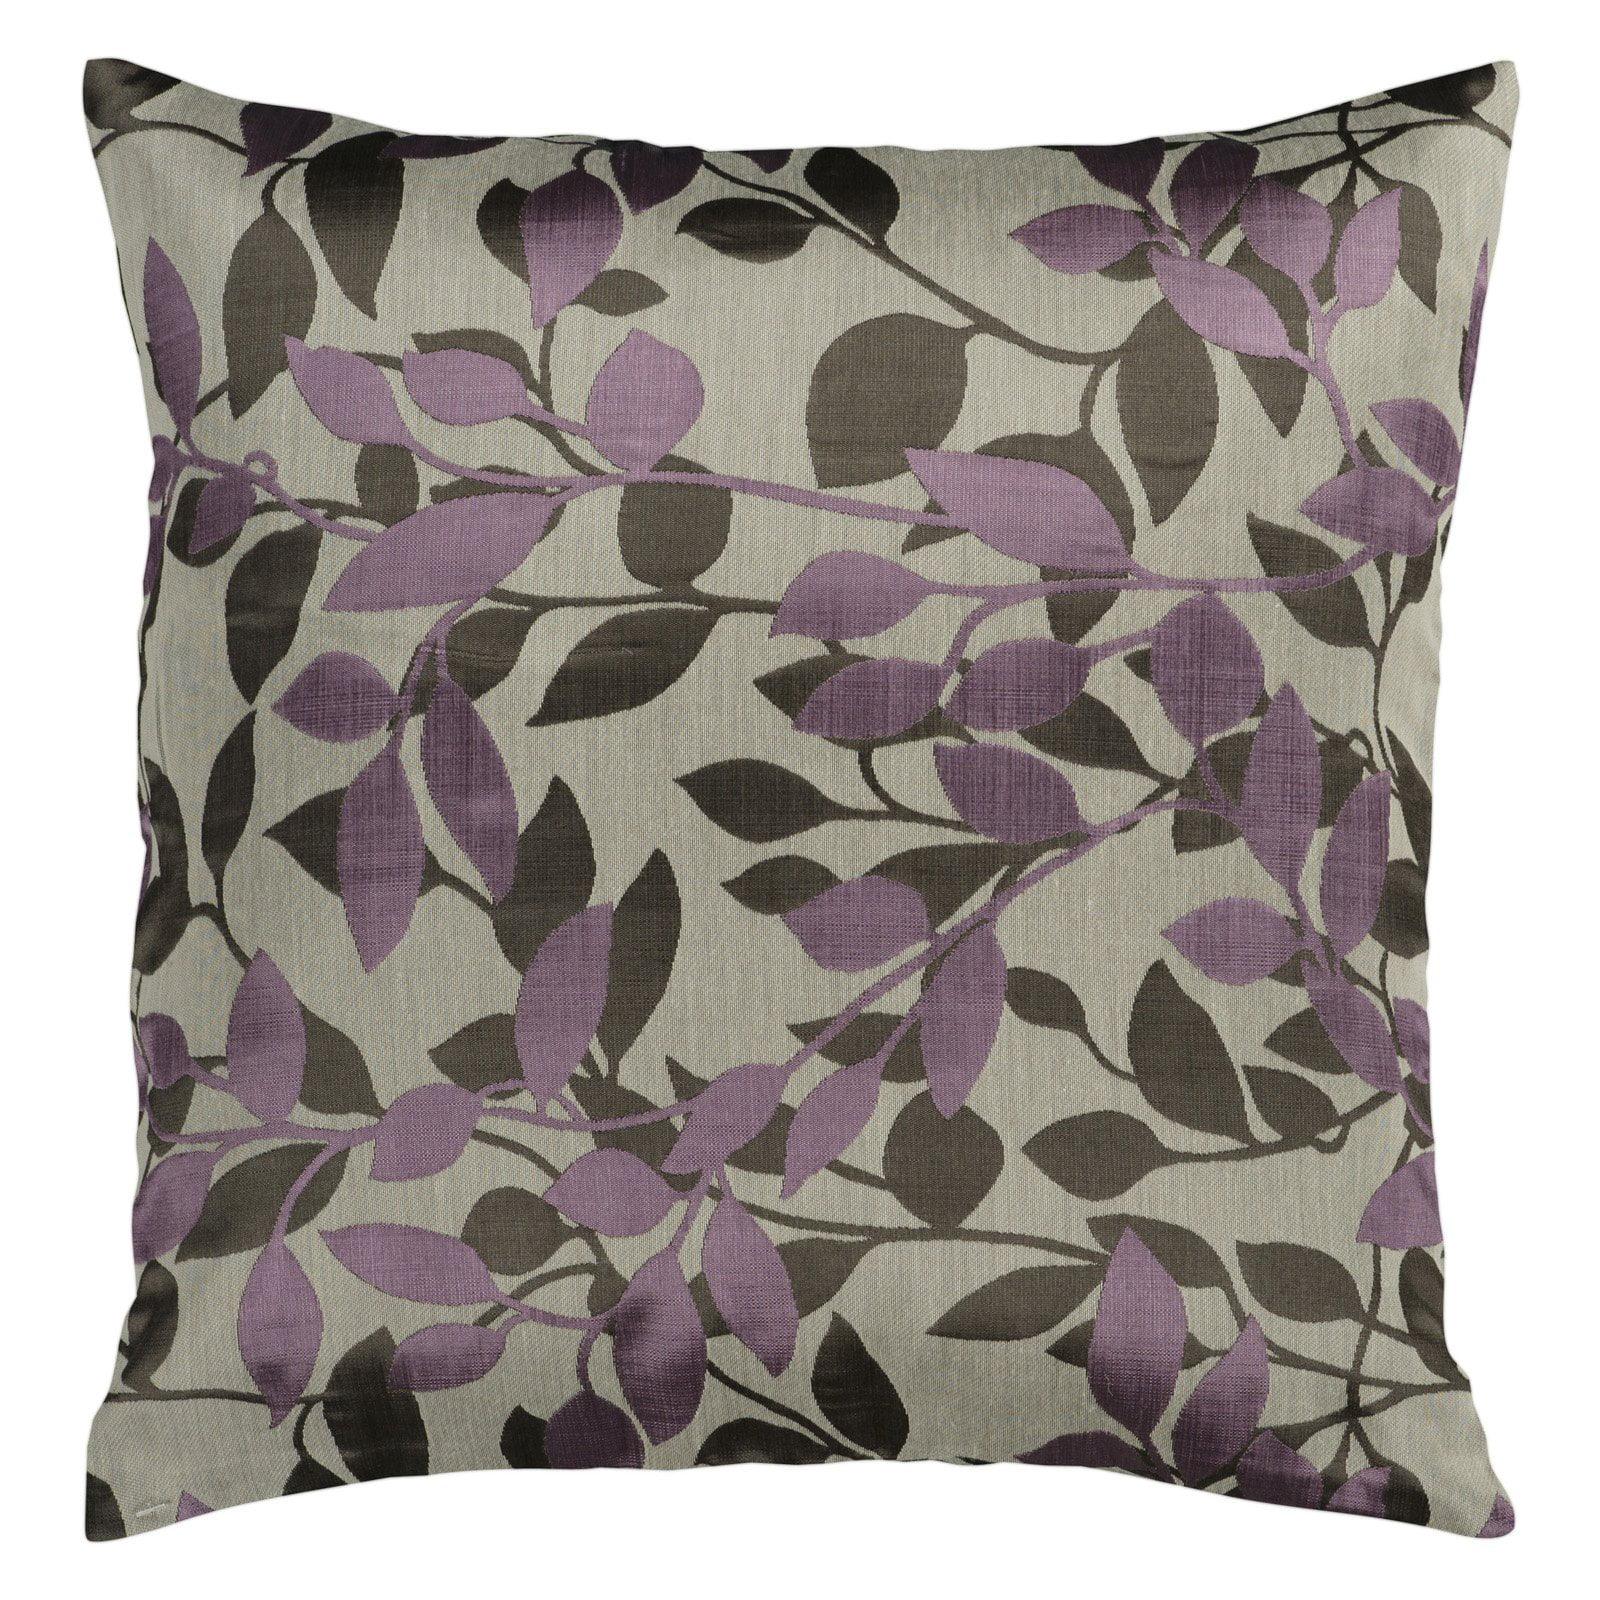 Surya Truro Decorative Pillow - Gray